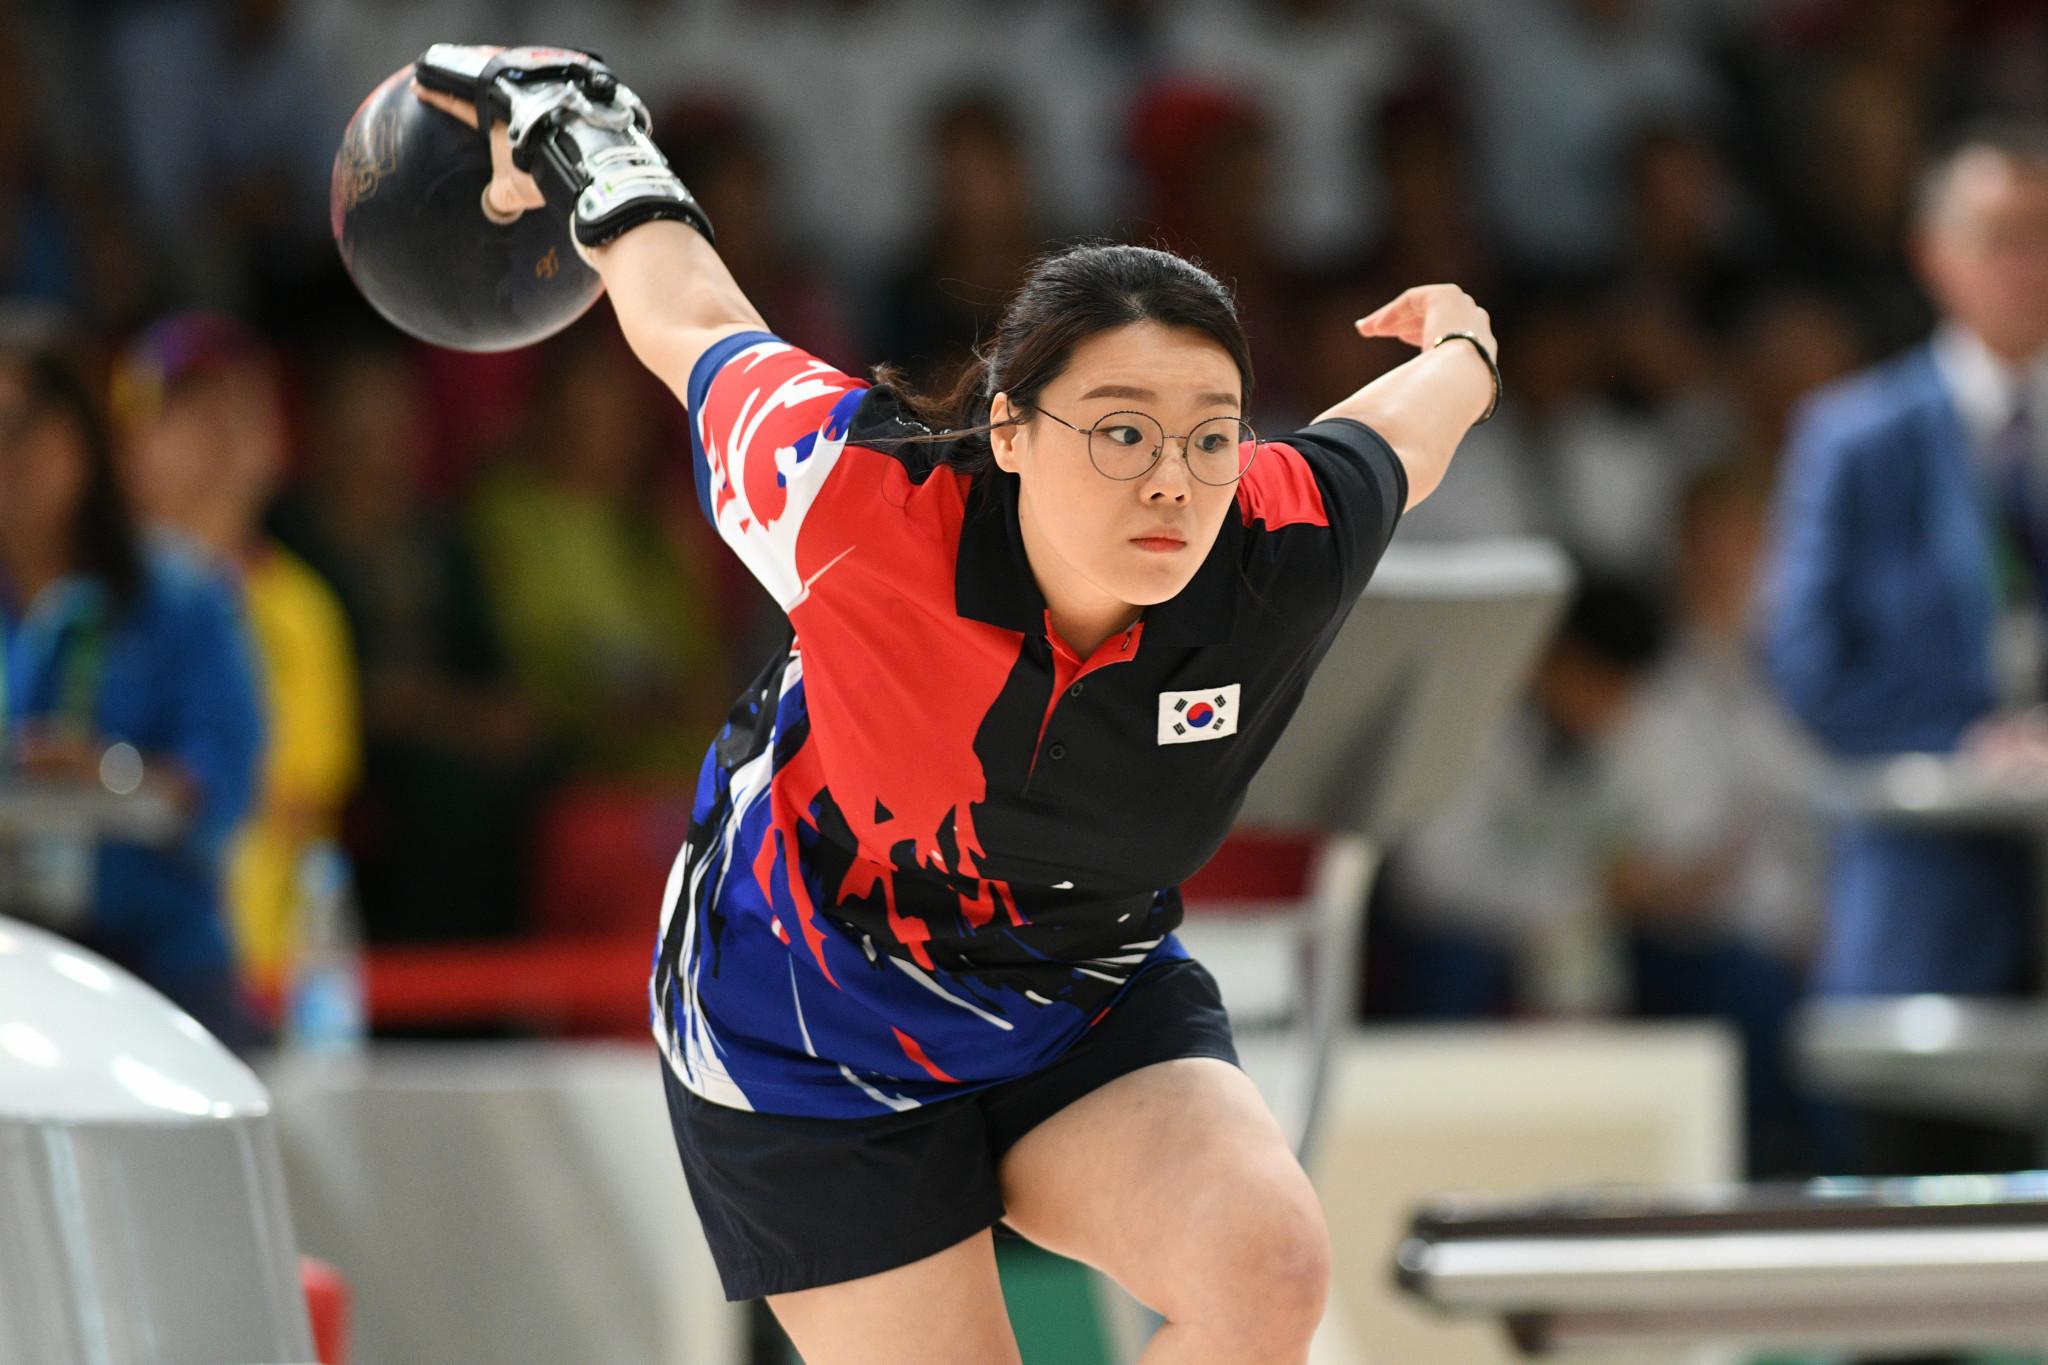 South Korea won the women's team of four title ©Ashgabat 2017/Nassos Triantafyllou/Laurel Photo Services